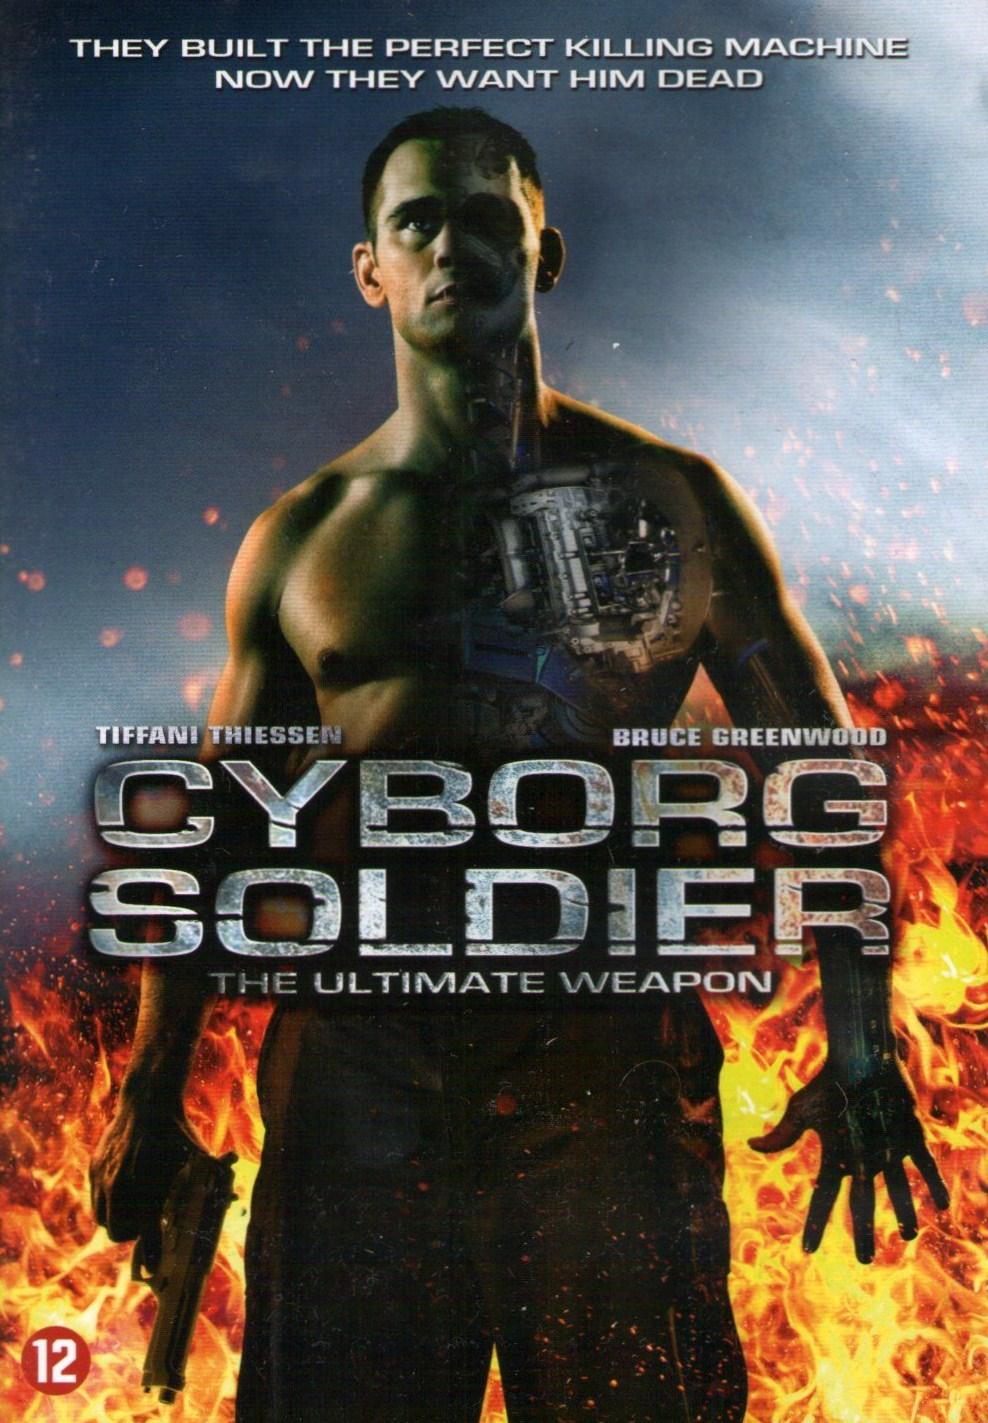 Cyborg Soldier Poster.JPG